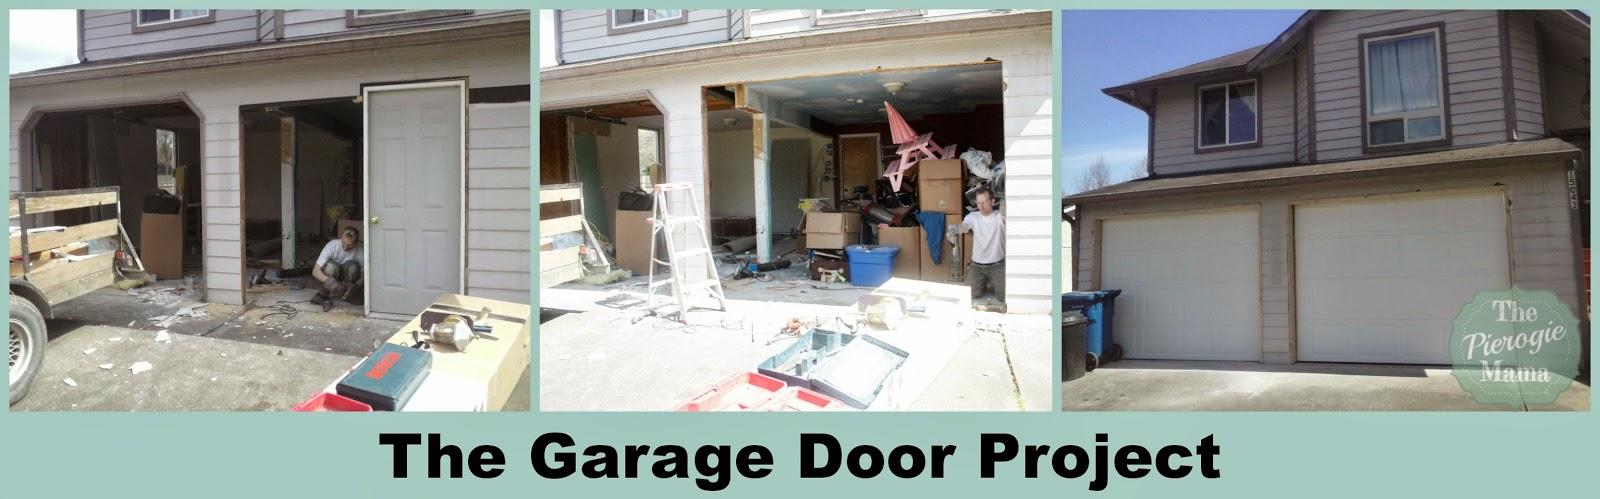 The Pierogie Mama: Under Construction: new garage doors